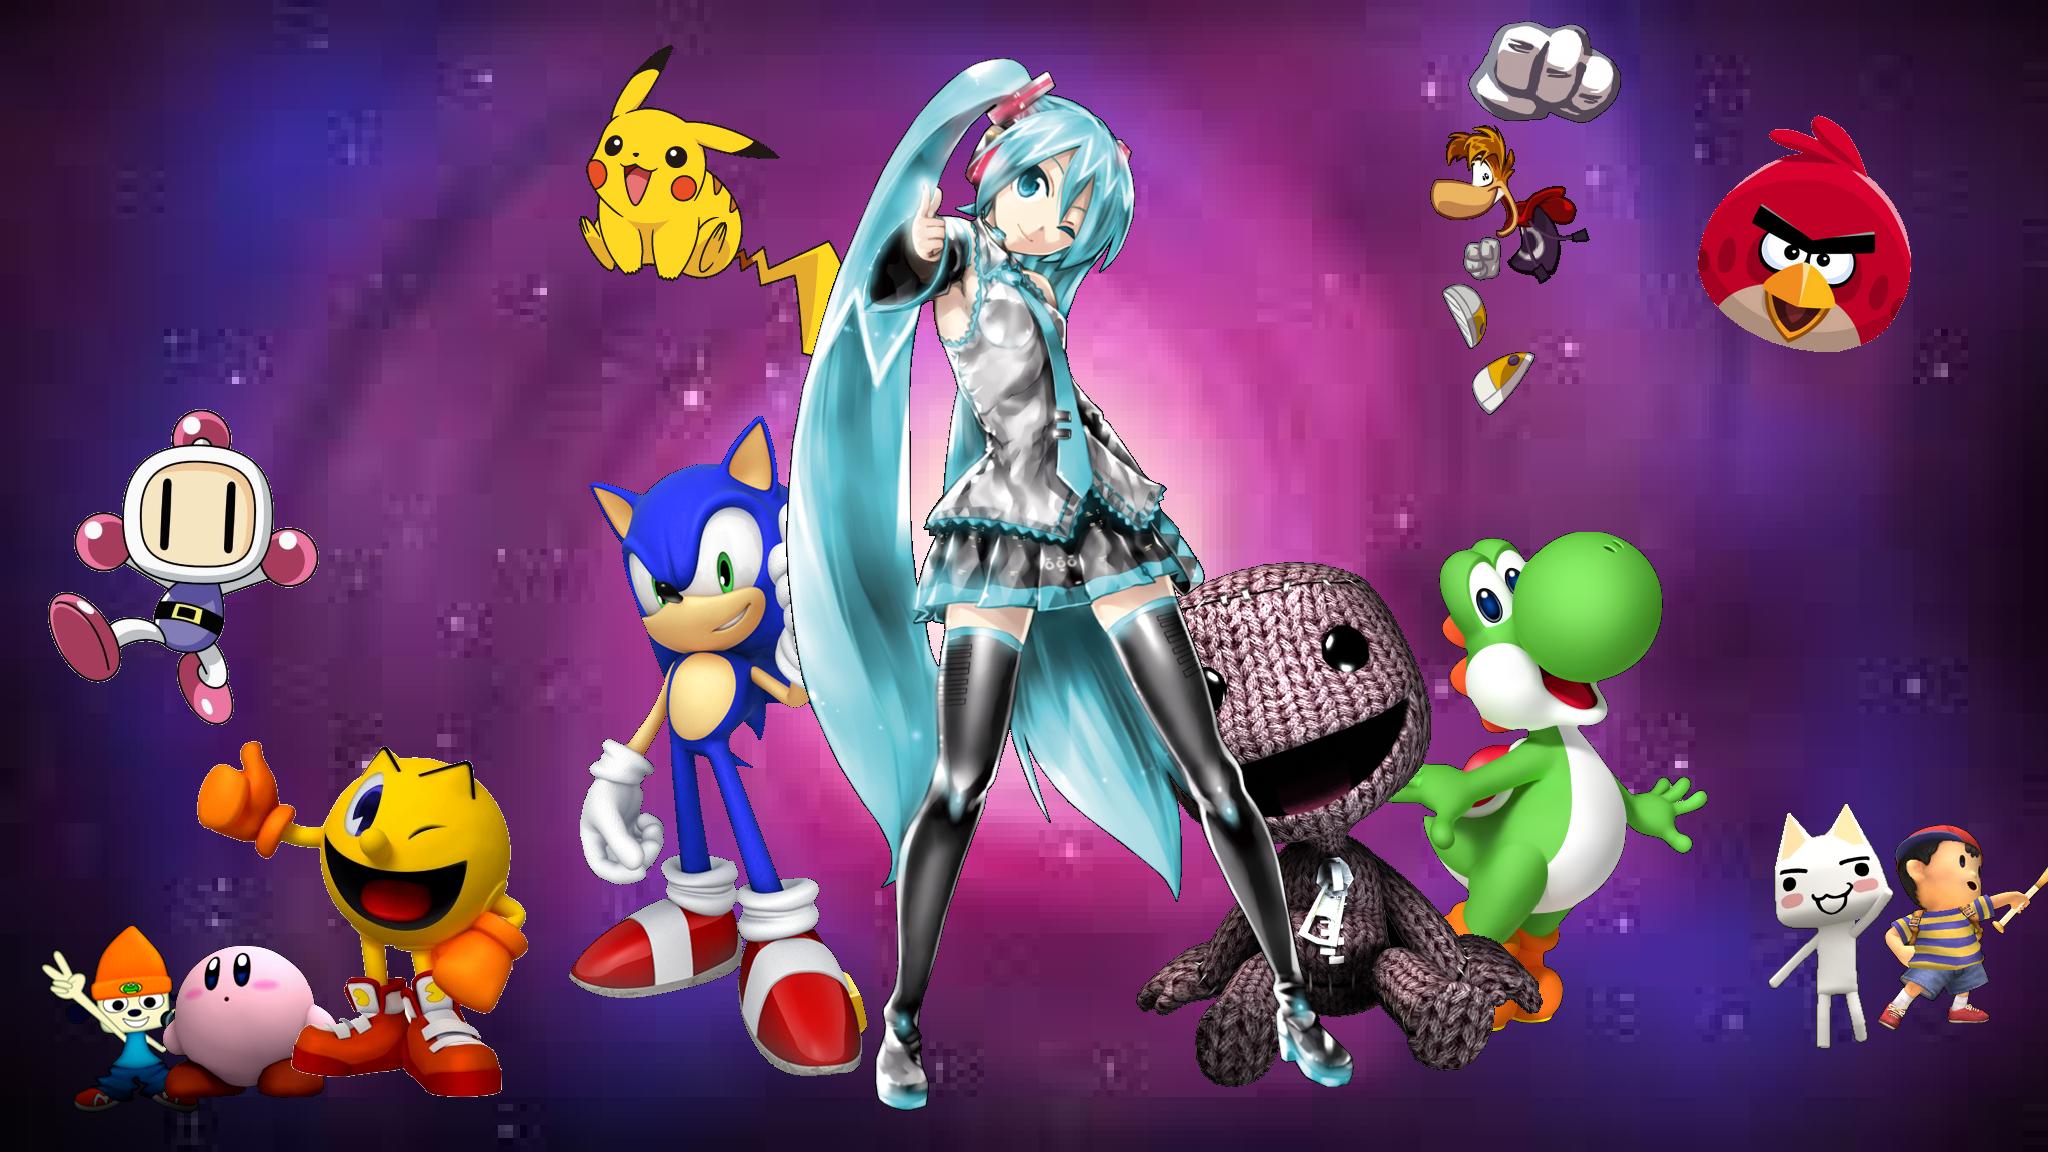 Hatsune Miku, Sonic, Pikachu, Rayman, Pacman, Kirby, etc